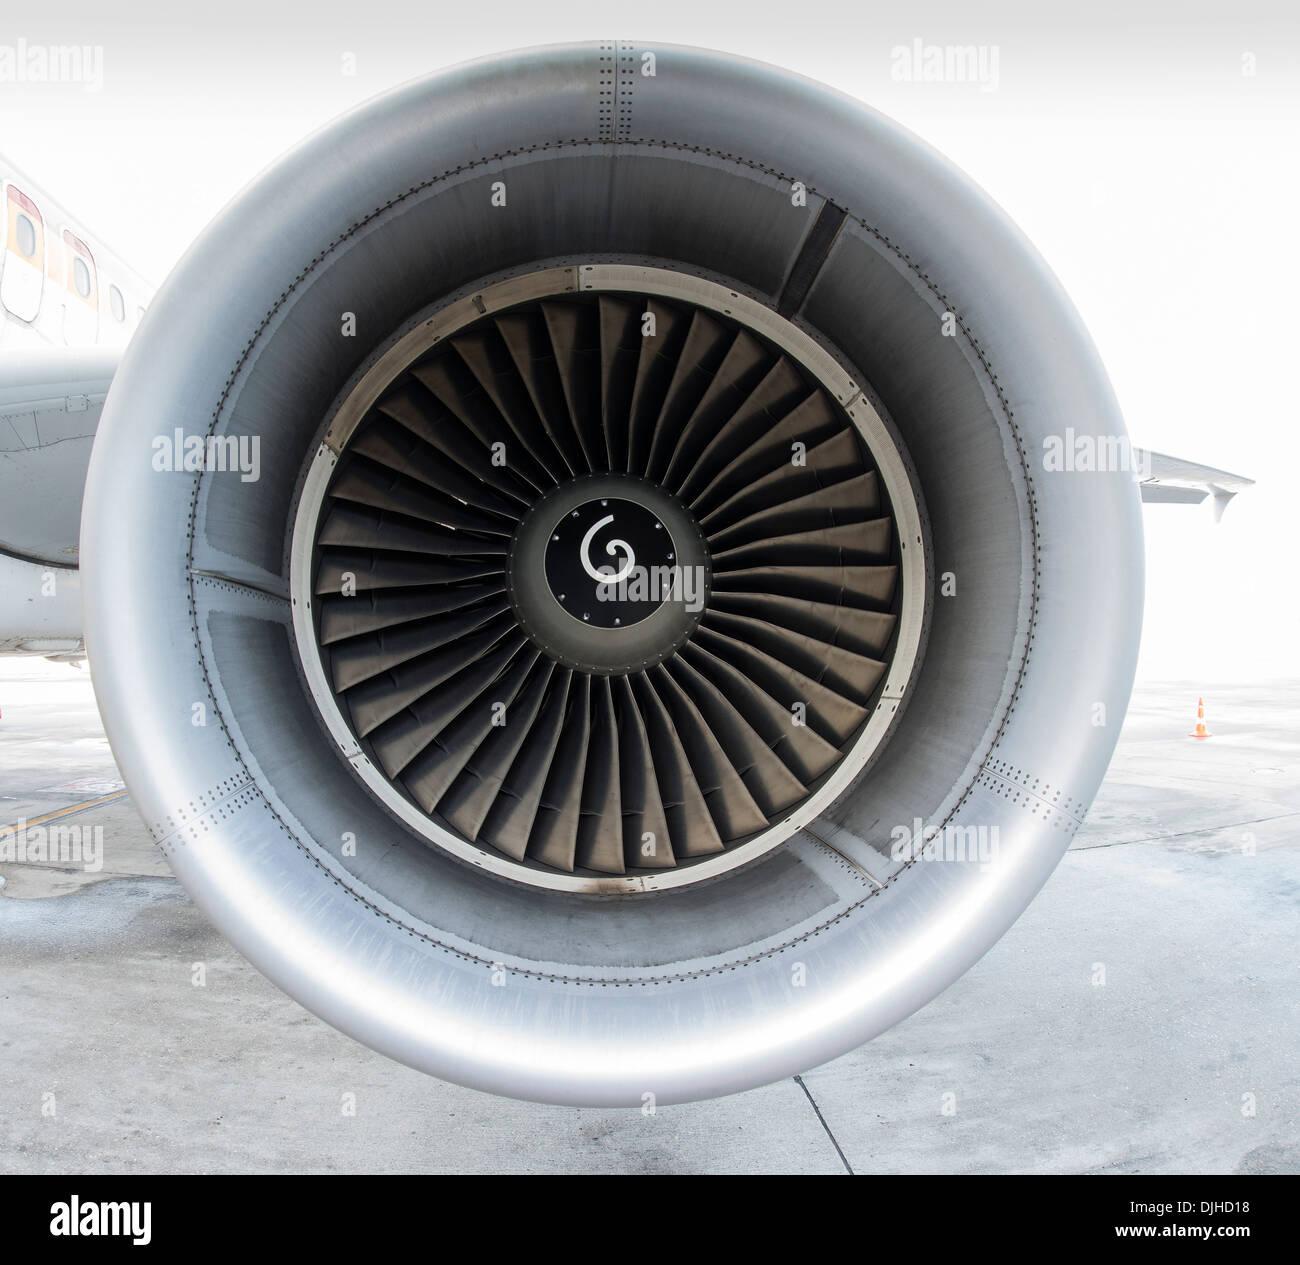 Turbofan - Stock Image